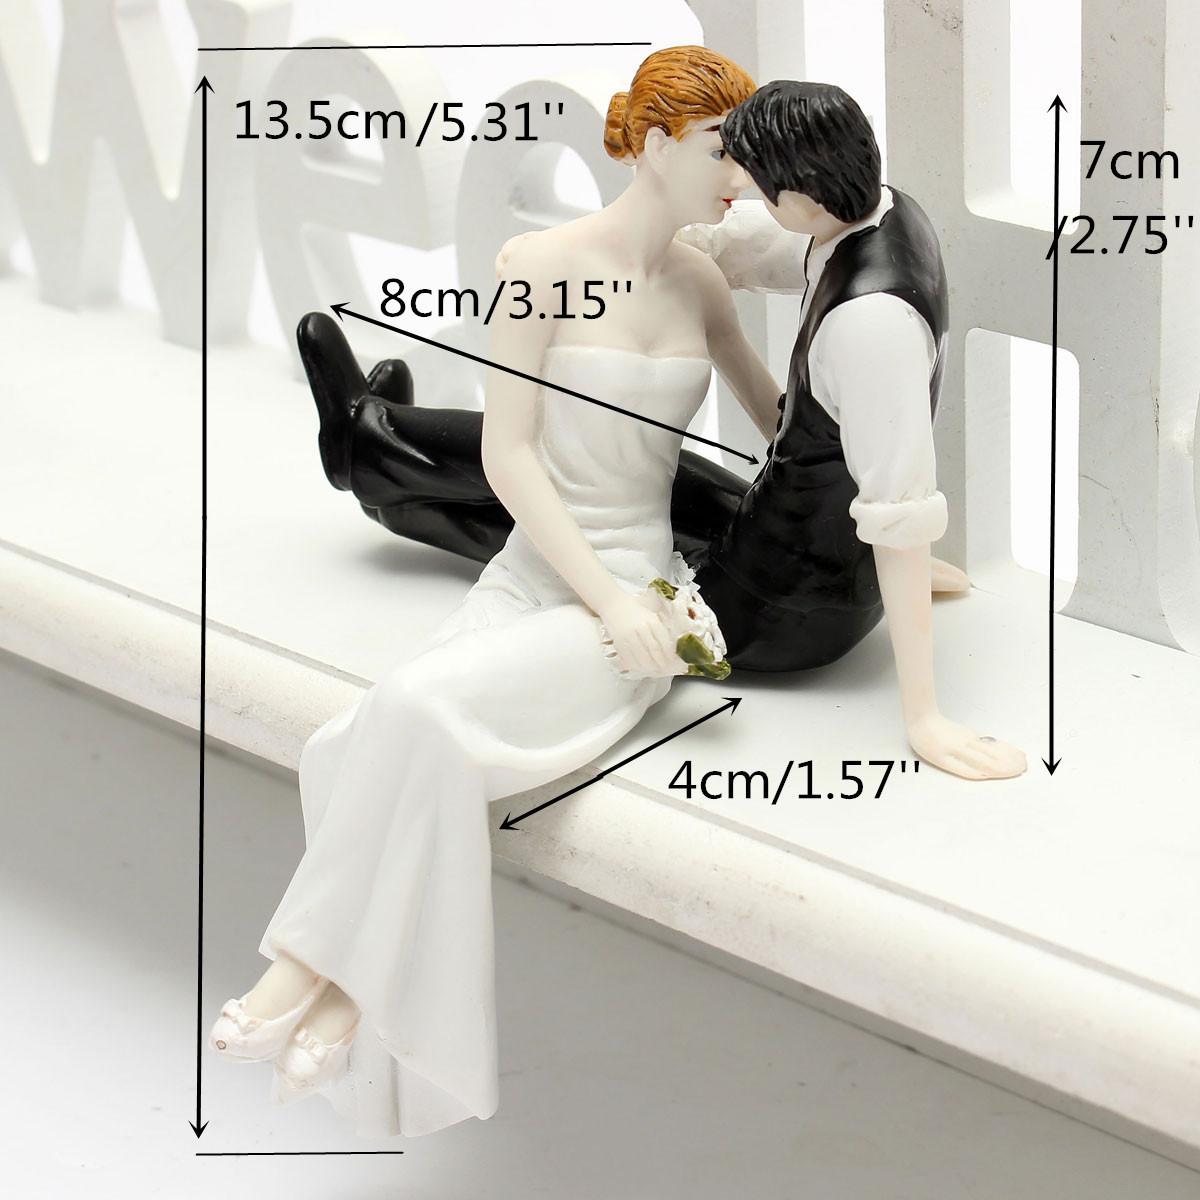 Romantic Bride and Groom Wedding Couple Figurine Kiss